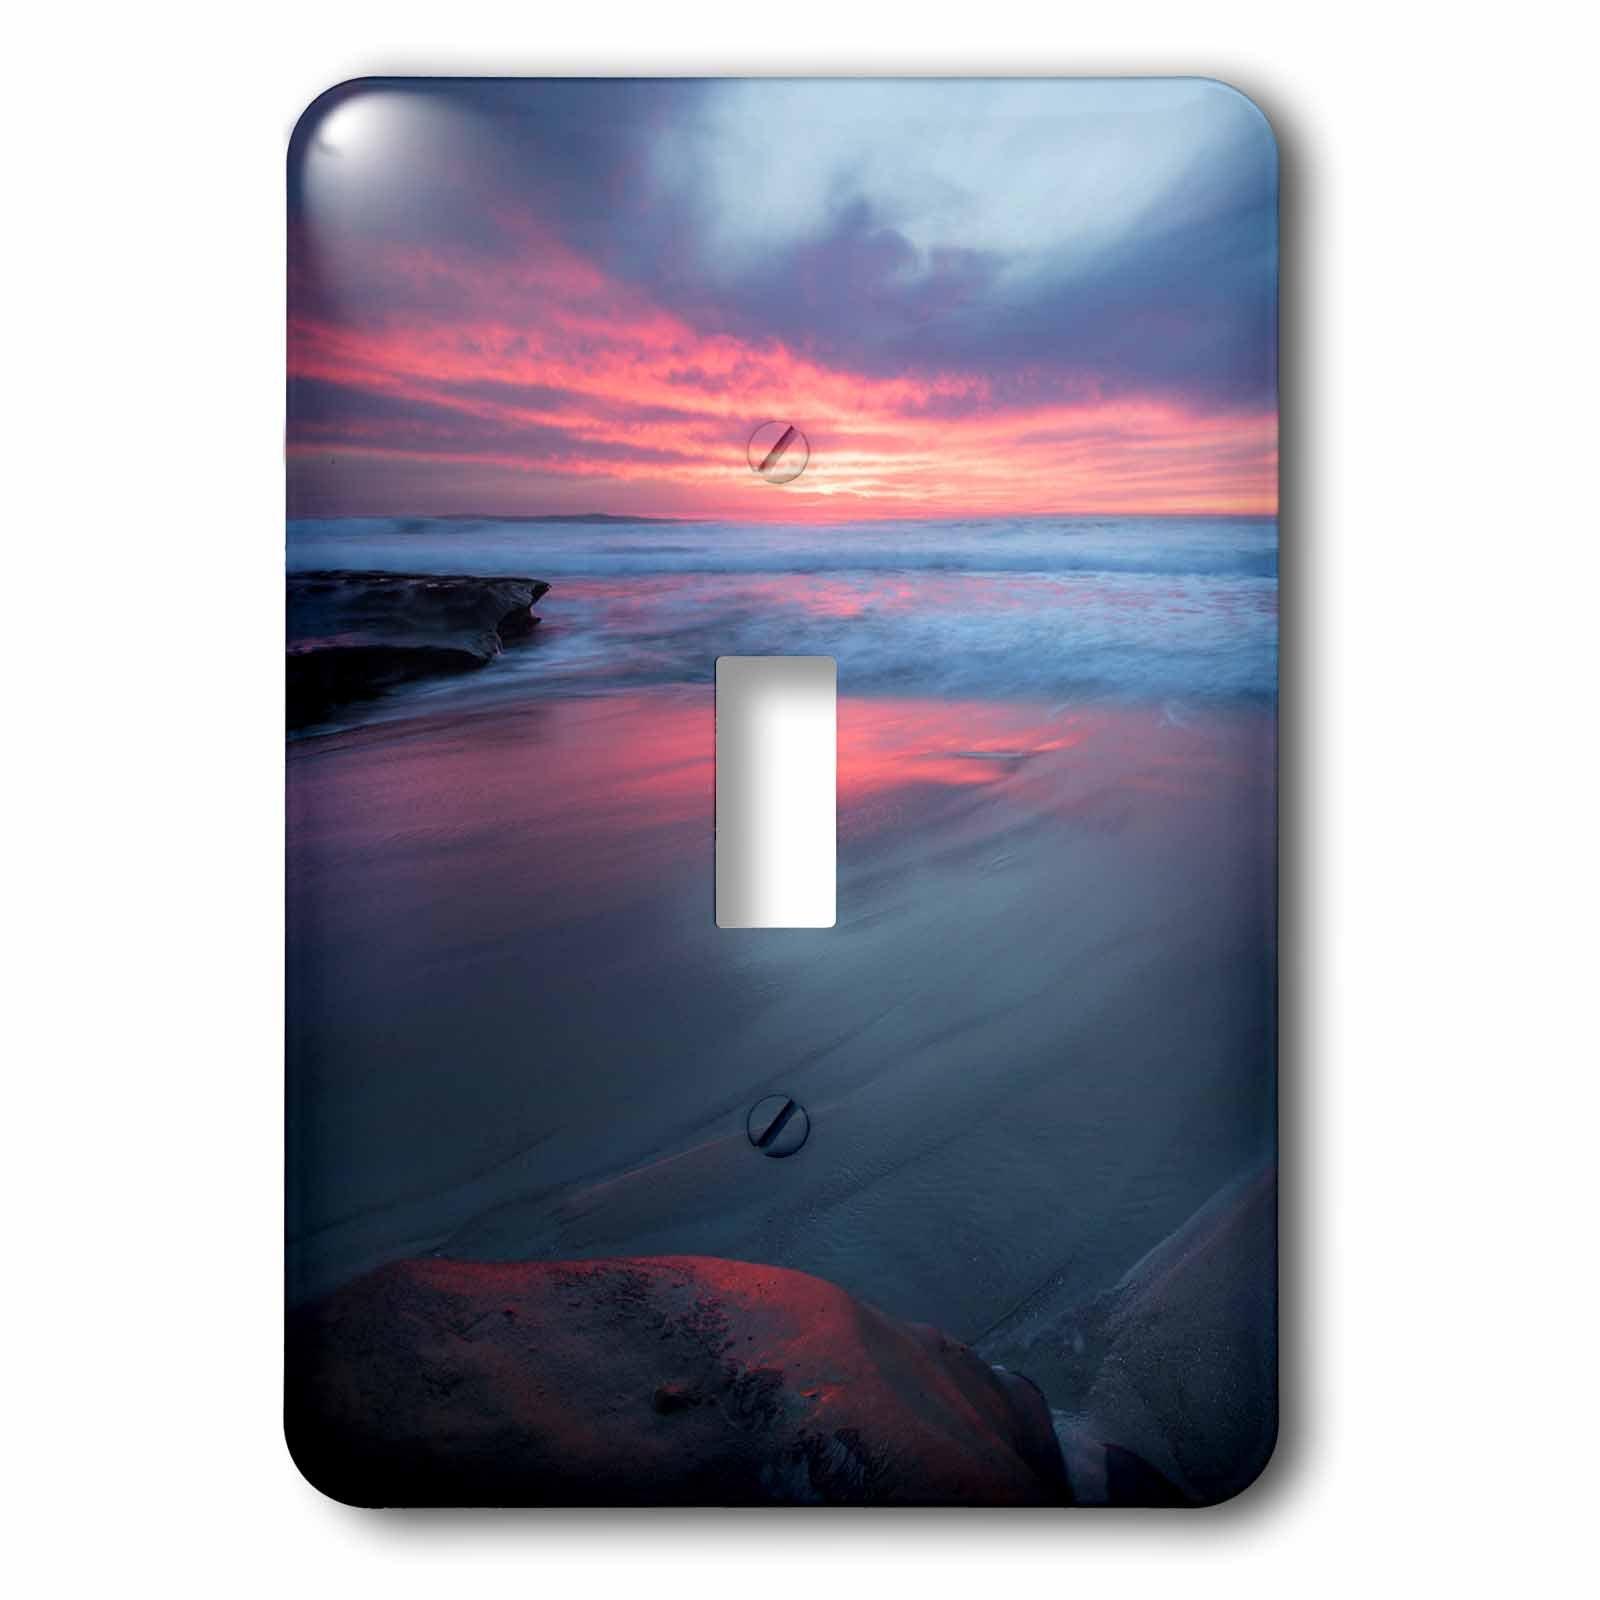 Virginia Chincoteague Island Shoreline scenic at sunrise 2 Plug Outlet Cover 3dRose lsp/_208717/_6 USA